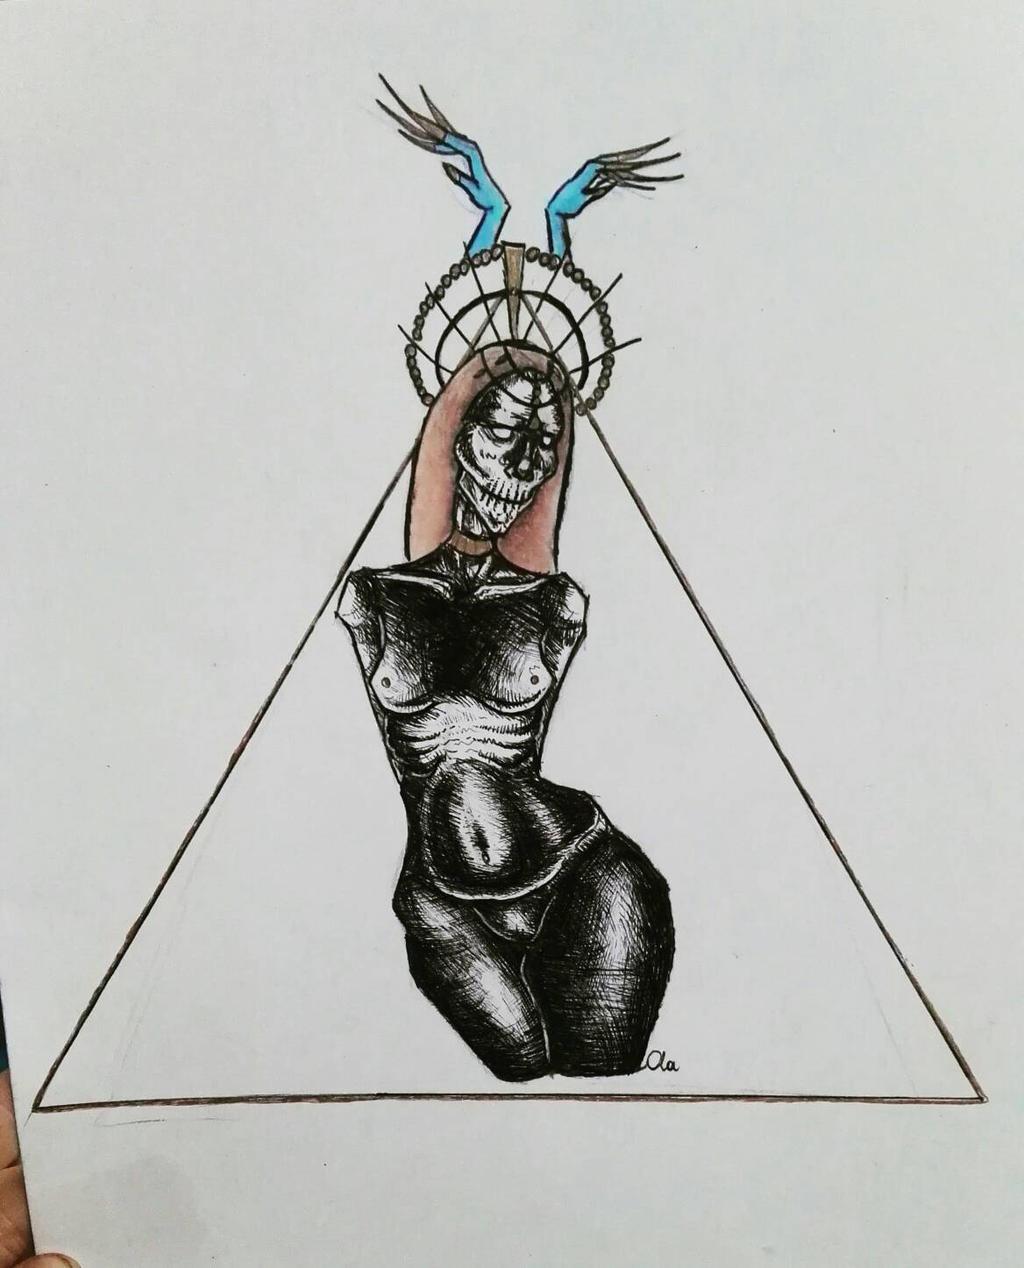 poludnica slavic demon by Alex-hime-san